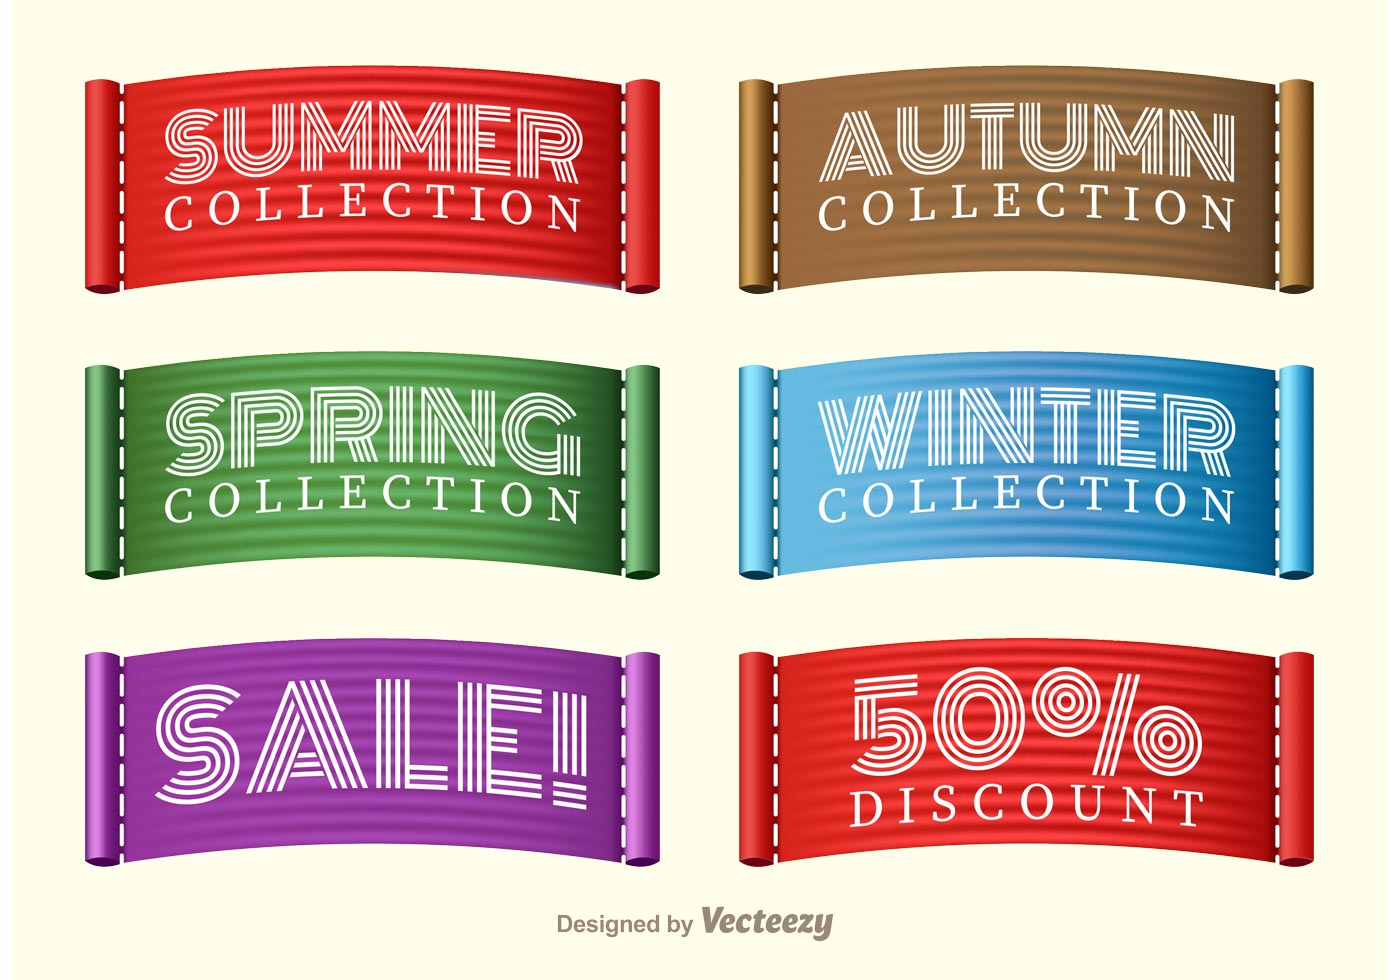 Stitched Seasons Sale Collection Label Vectors